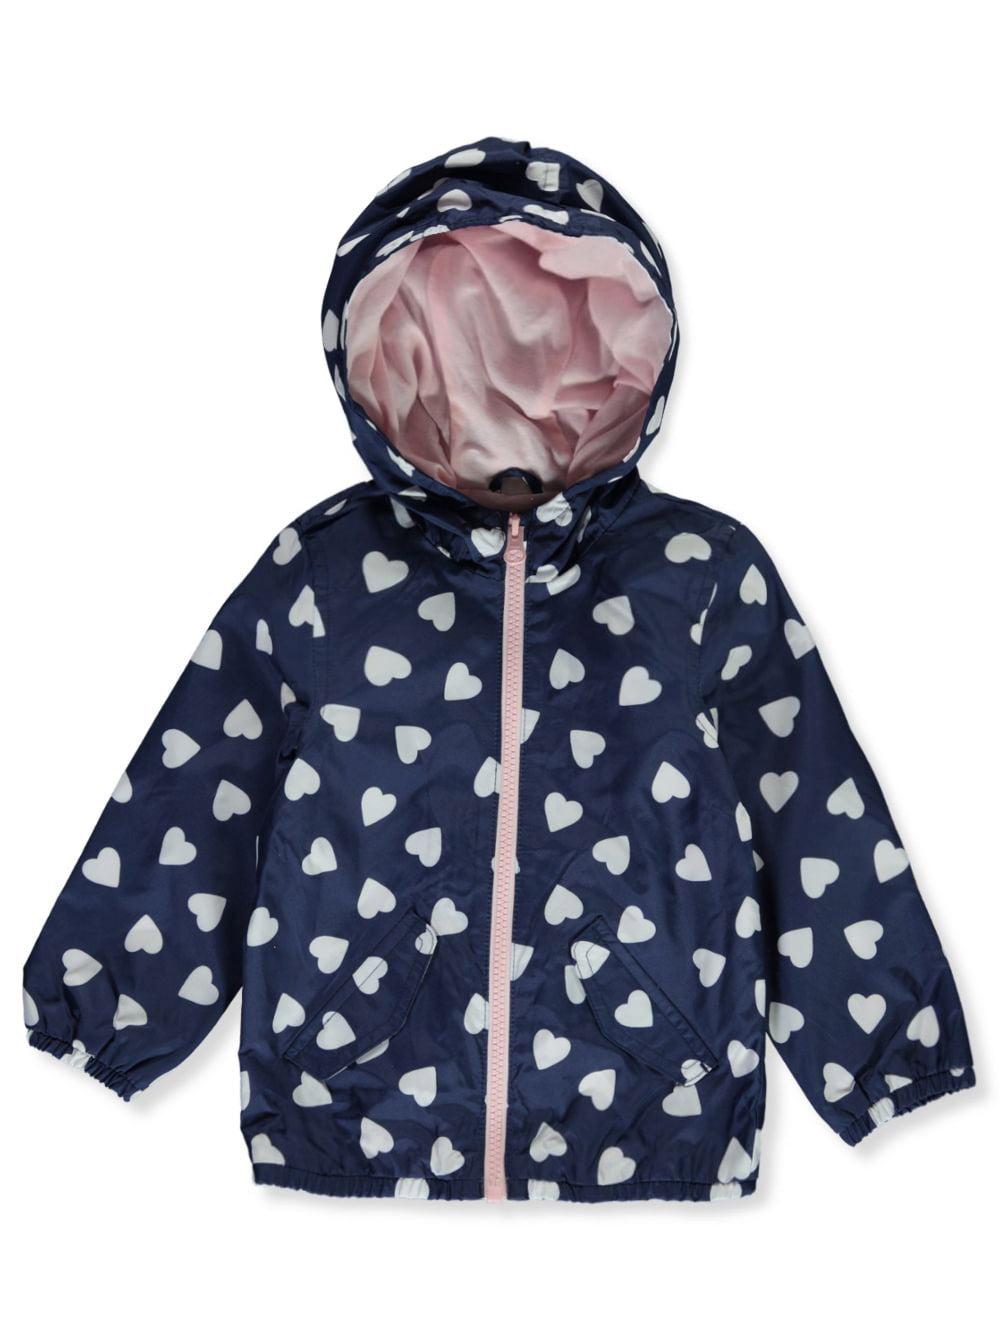 Athletic Works Baby Boys' Hooded Jacket | Walmart Canada |Walmart Baby Jackets